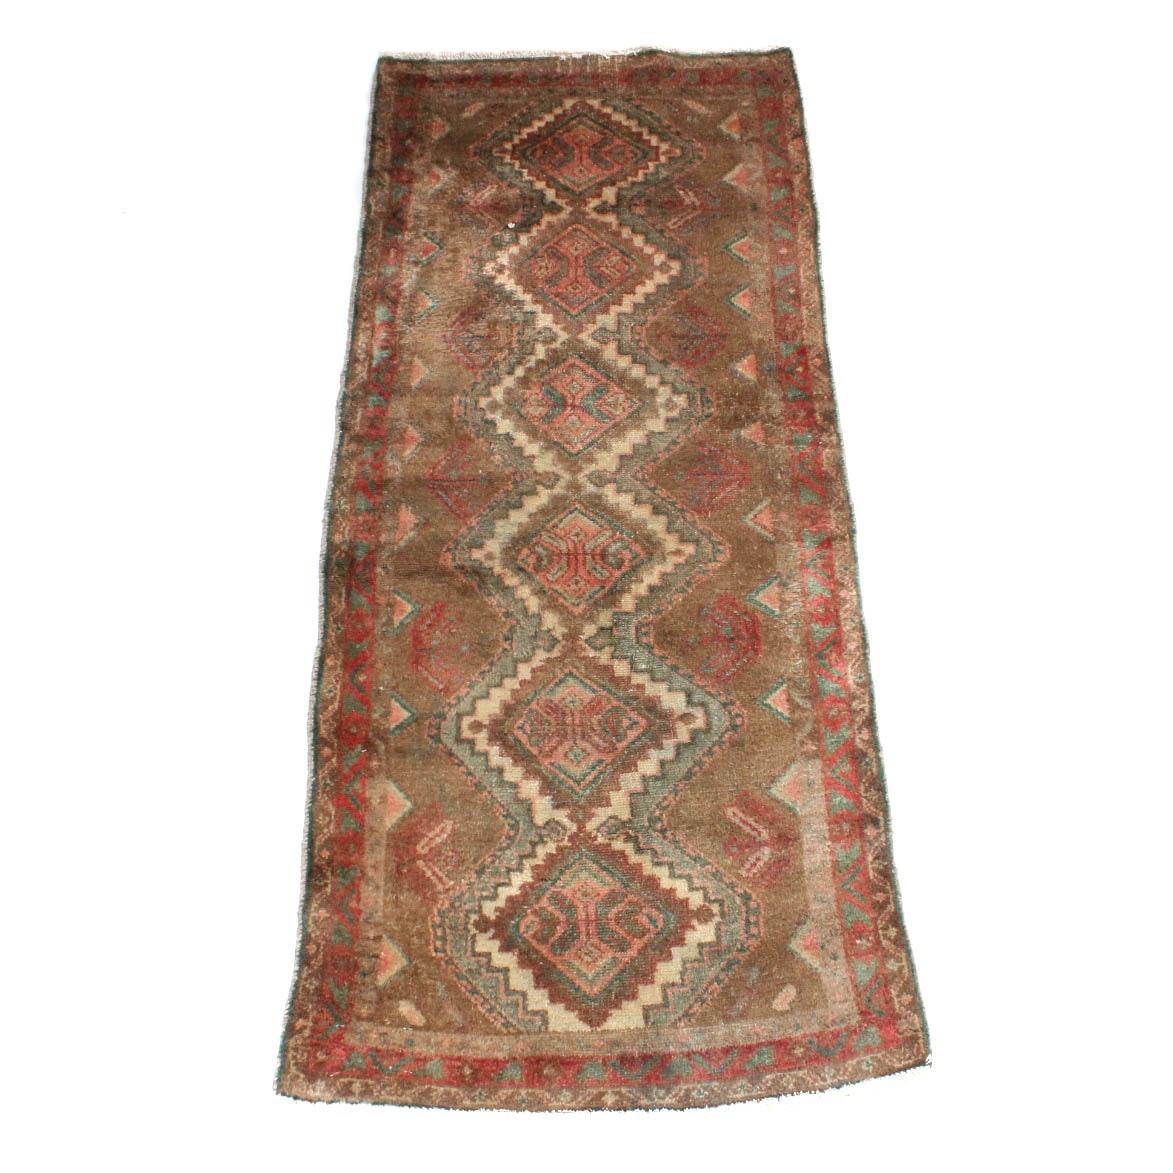 Semi-Antique Hand-Knotted Persian Heriz Carpet Runner